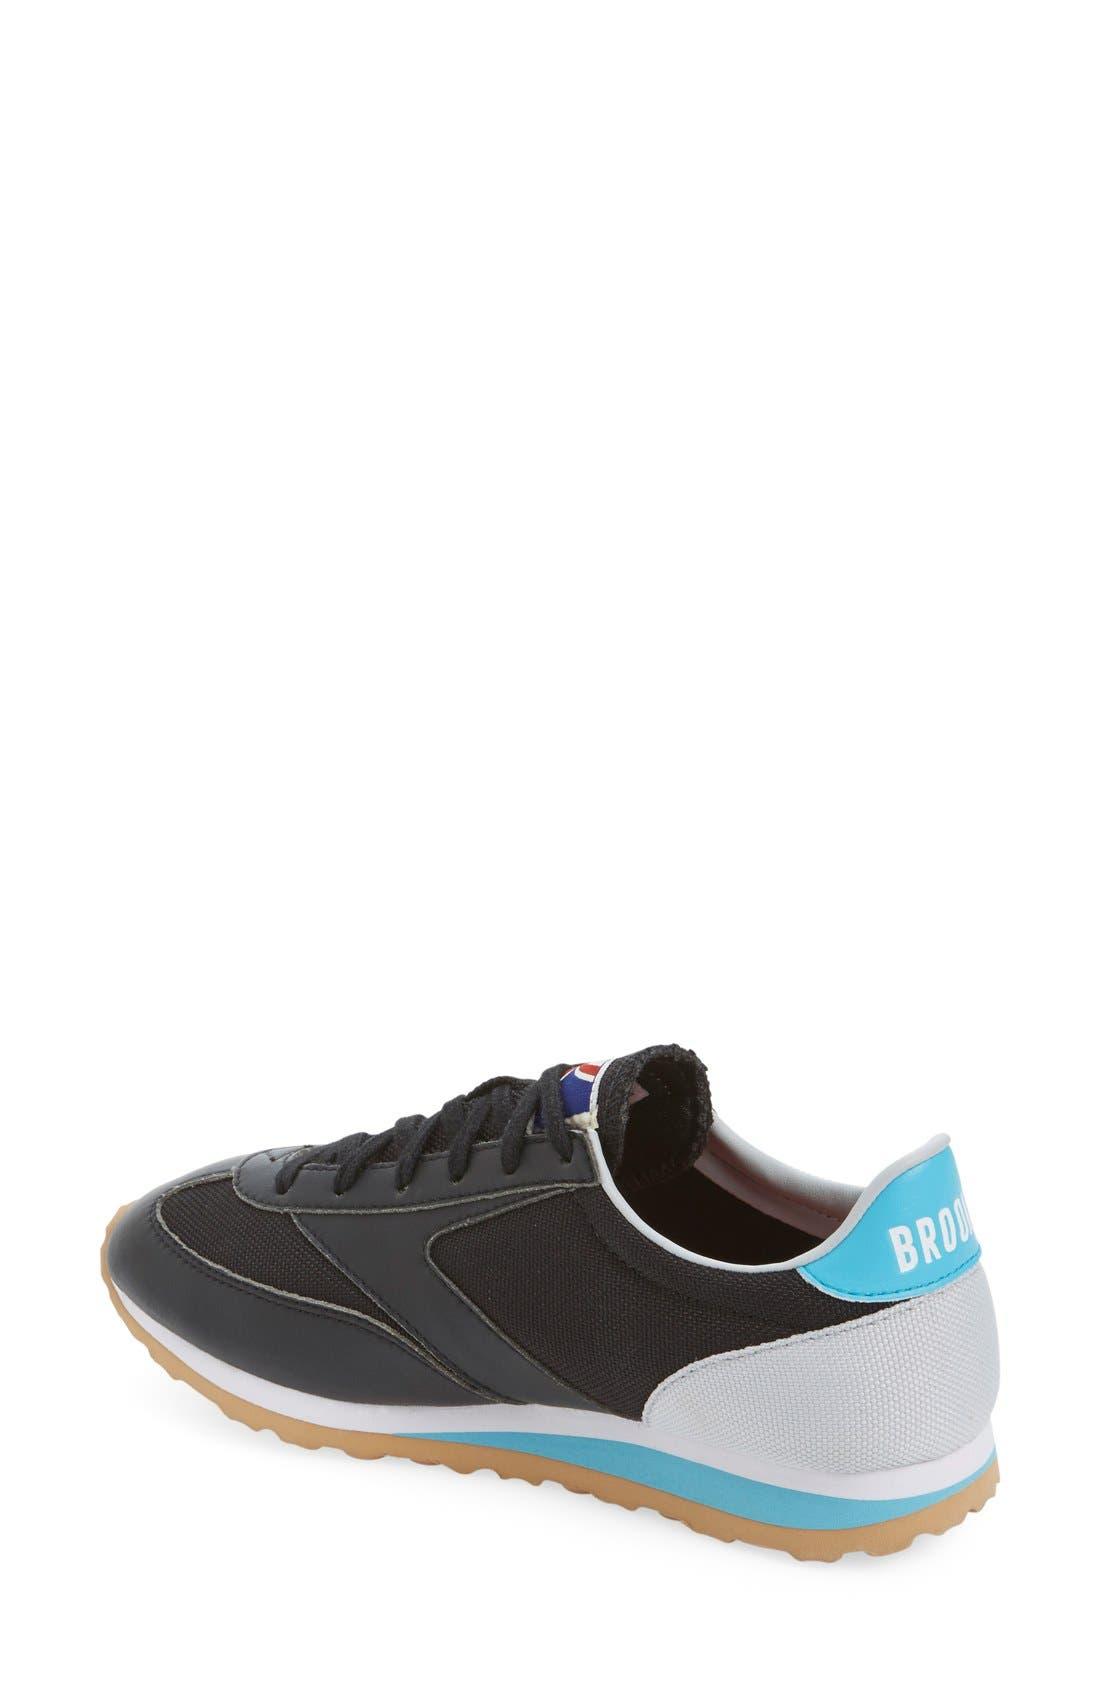 'Vanguard' Sneaker,                             Alternate thumbnail 61, color,